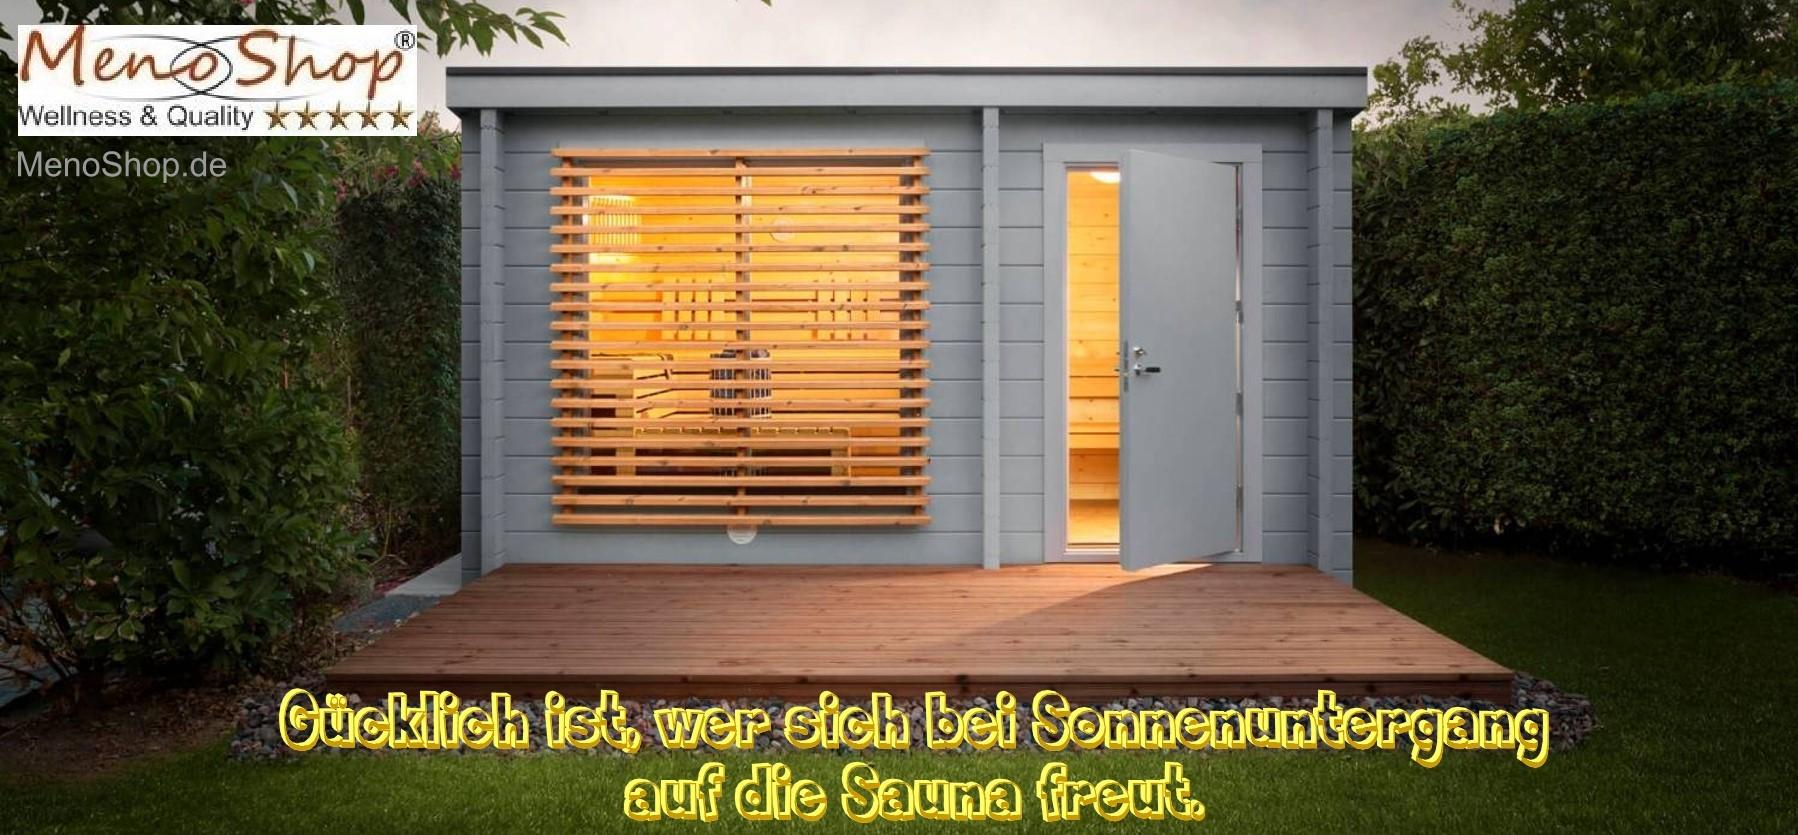 Aussensauna Gartensauna Draussensauna Viliv Wellness Sauna